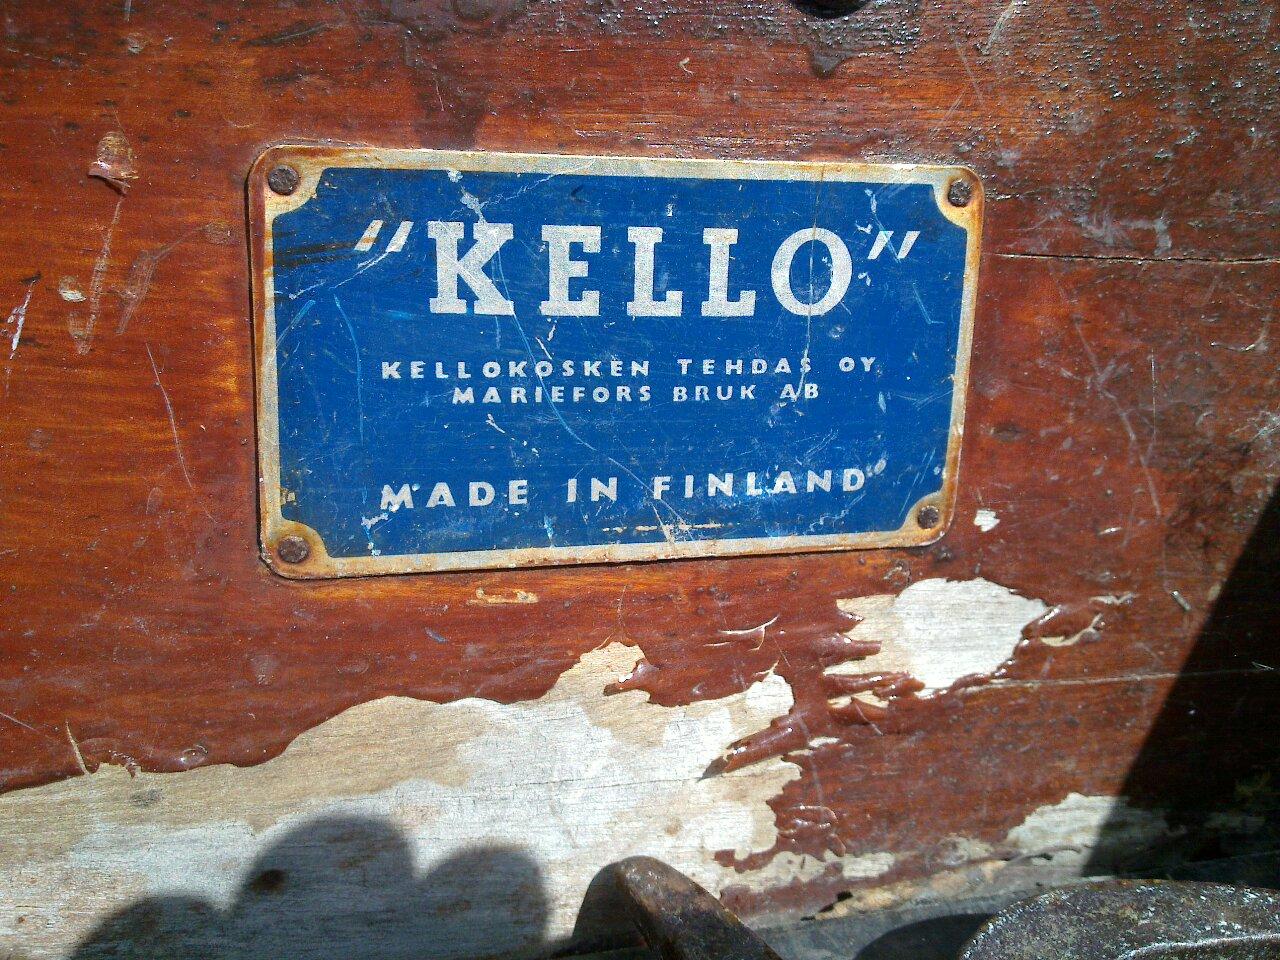 File:Kello-vene kilpi Kellokosken tehdas – Mariefors Bruk